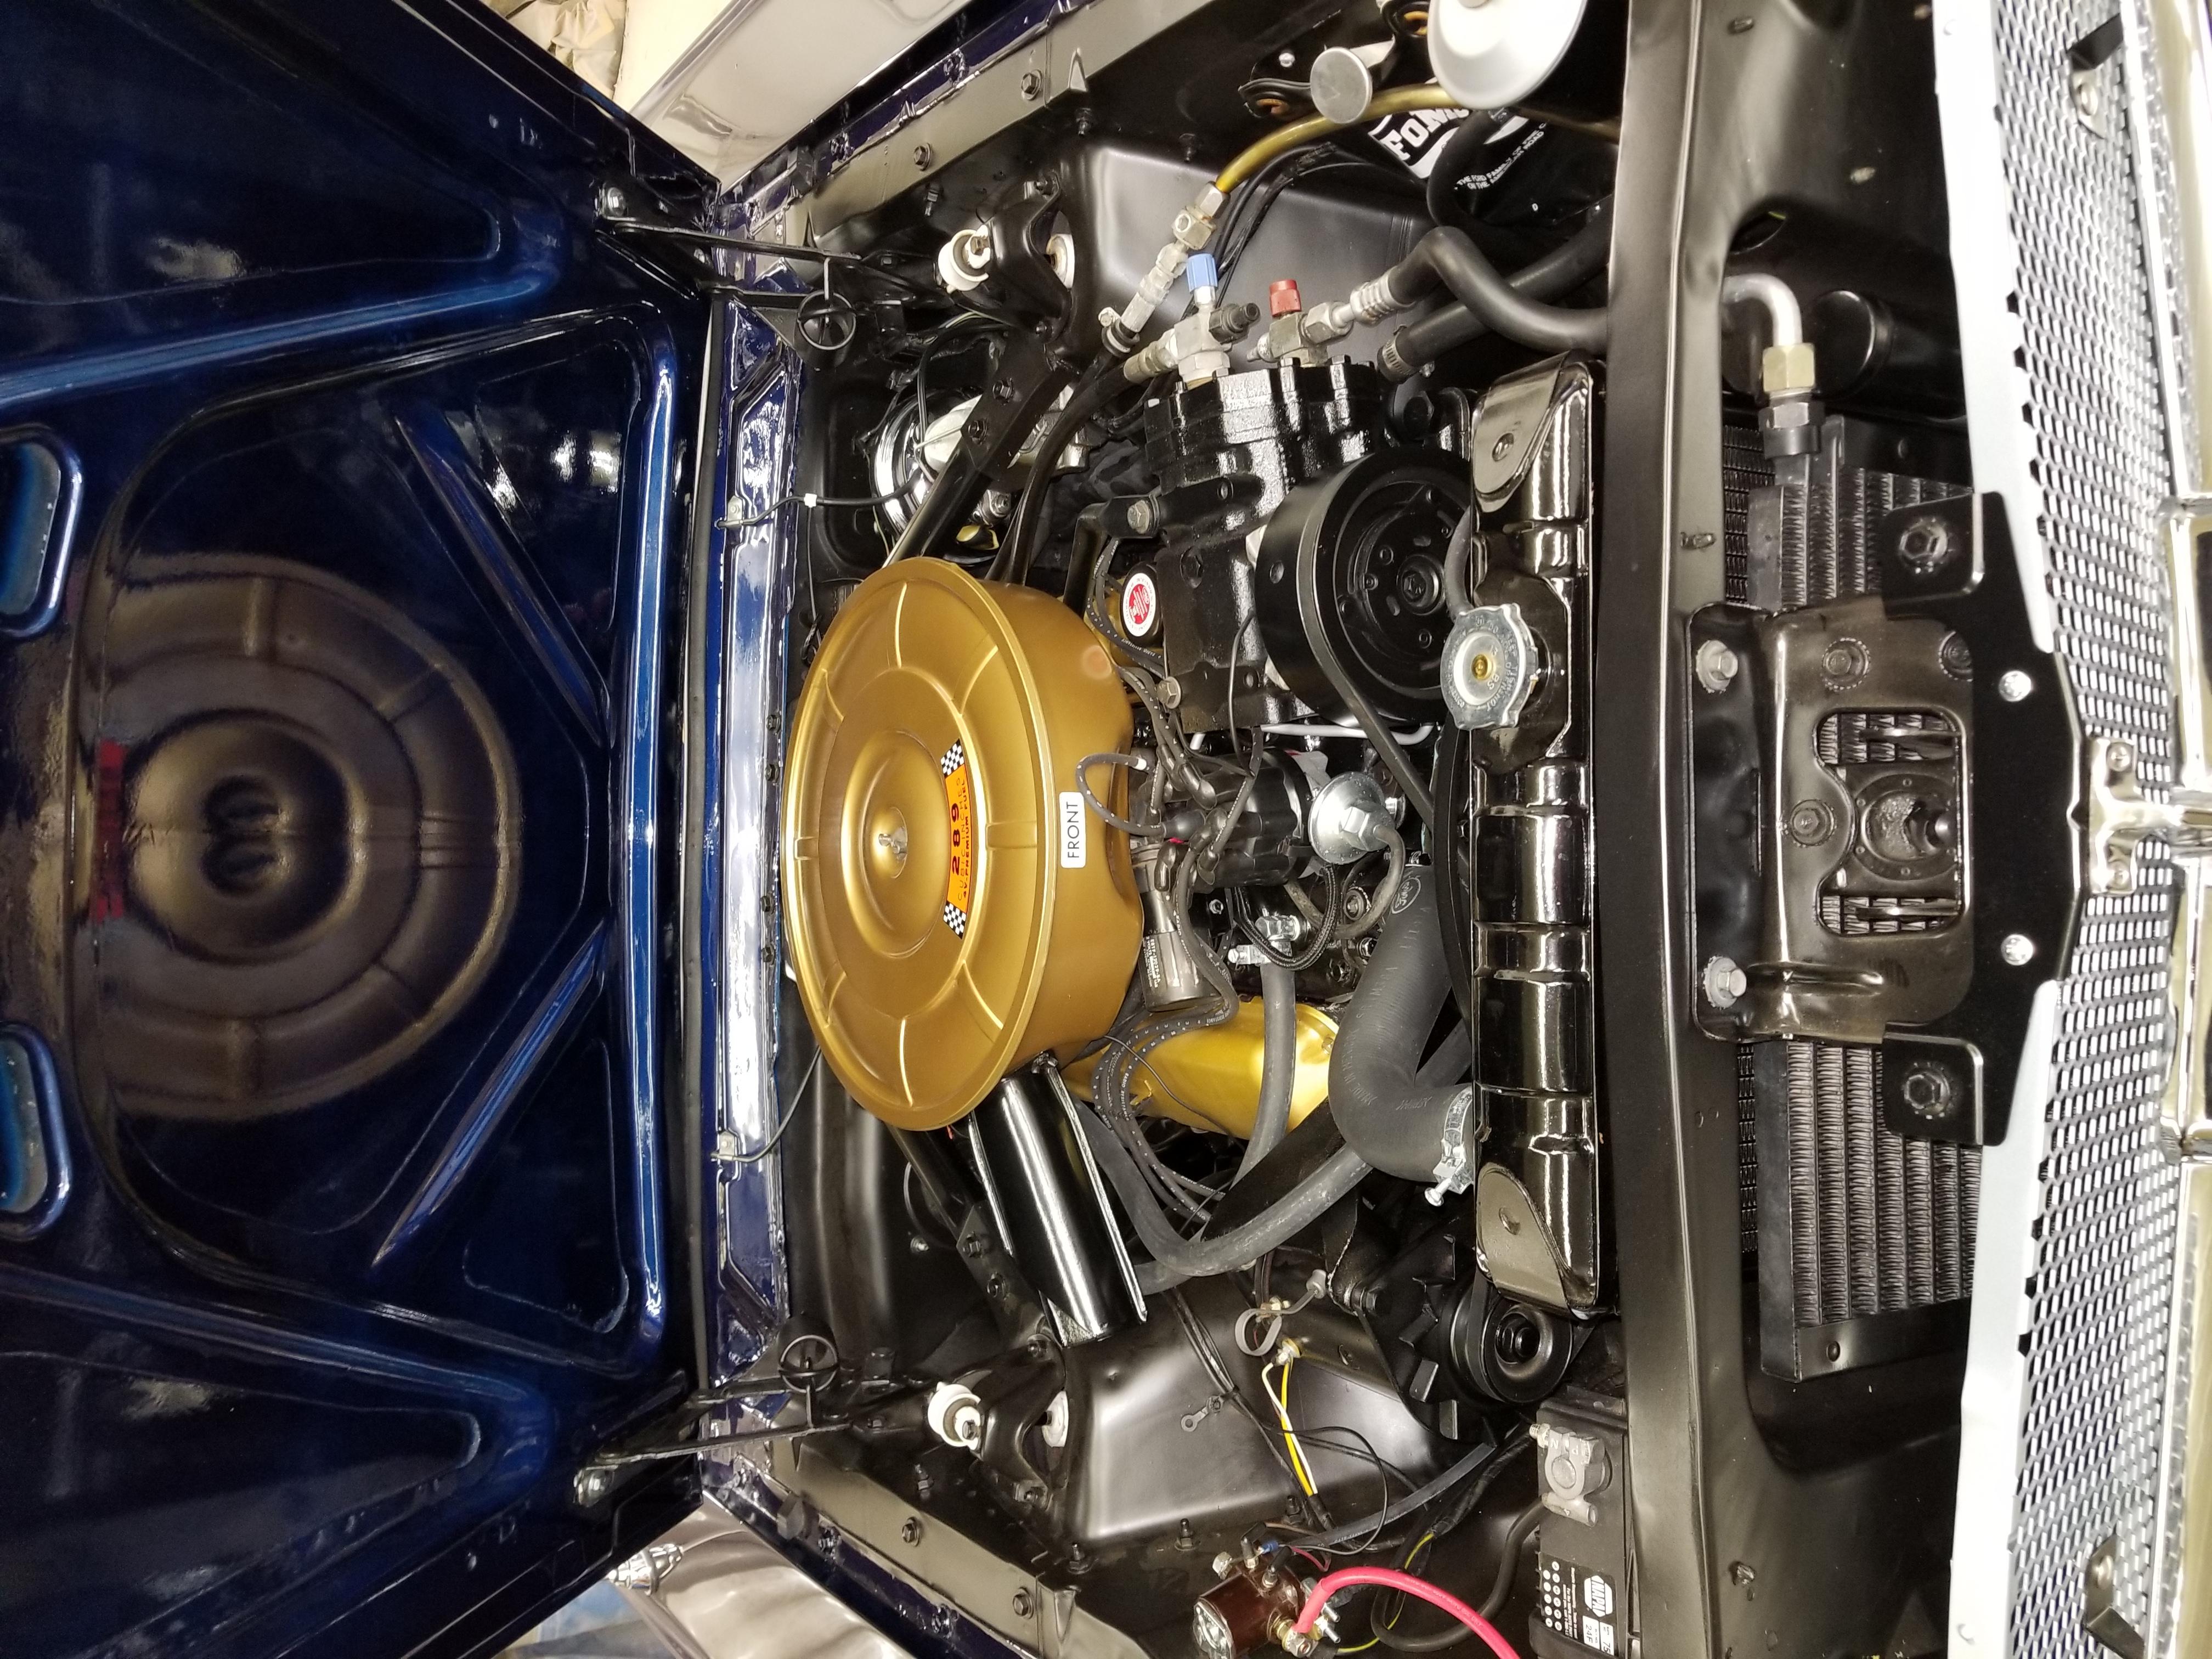 64 Mustang